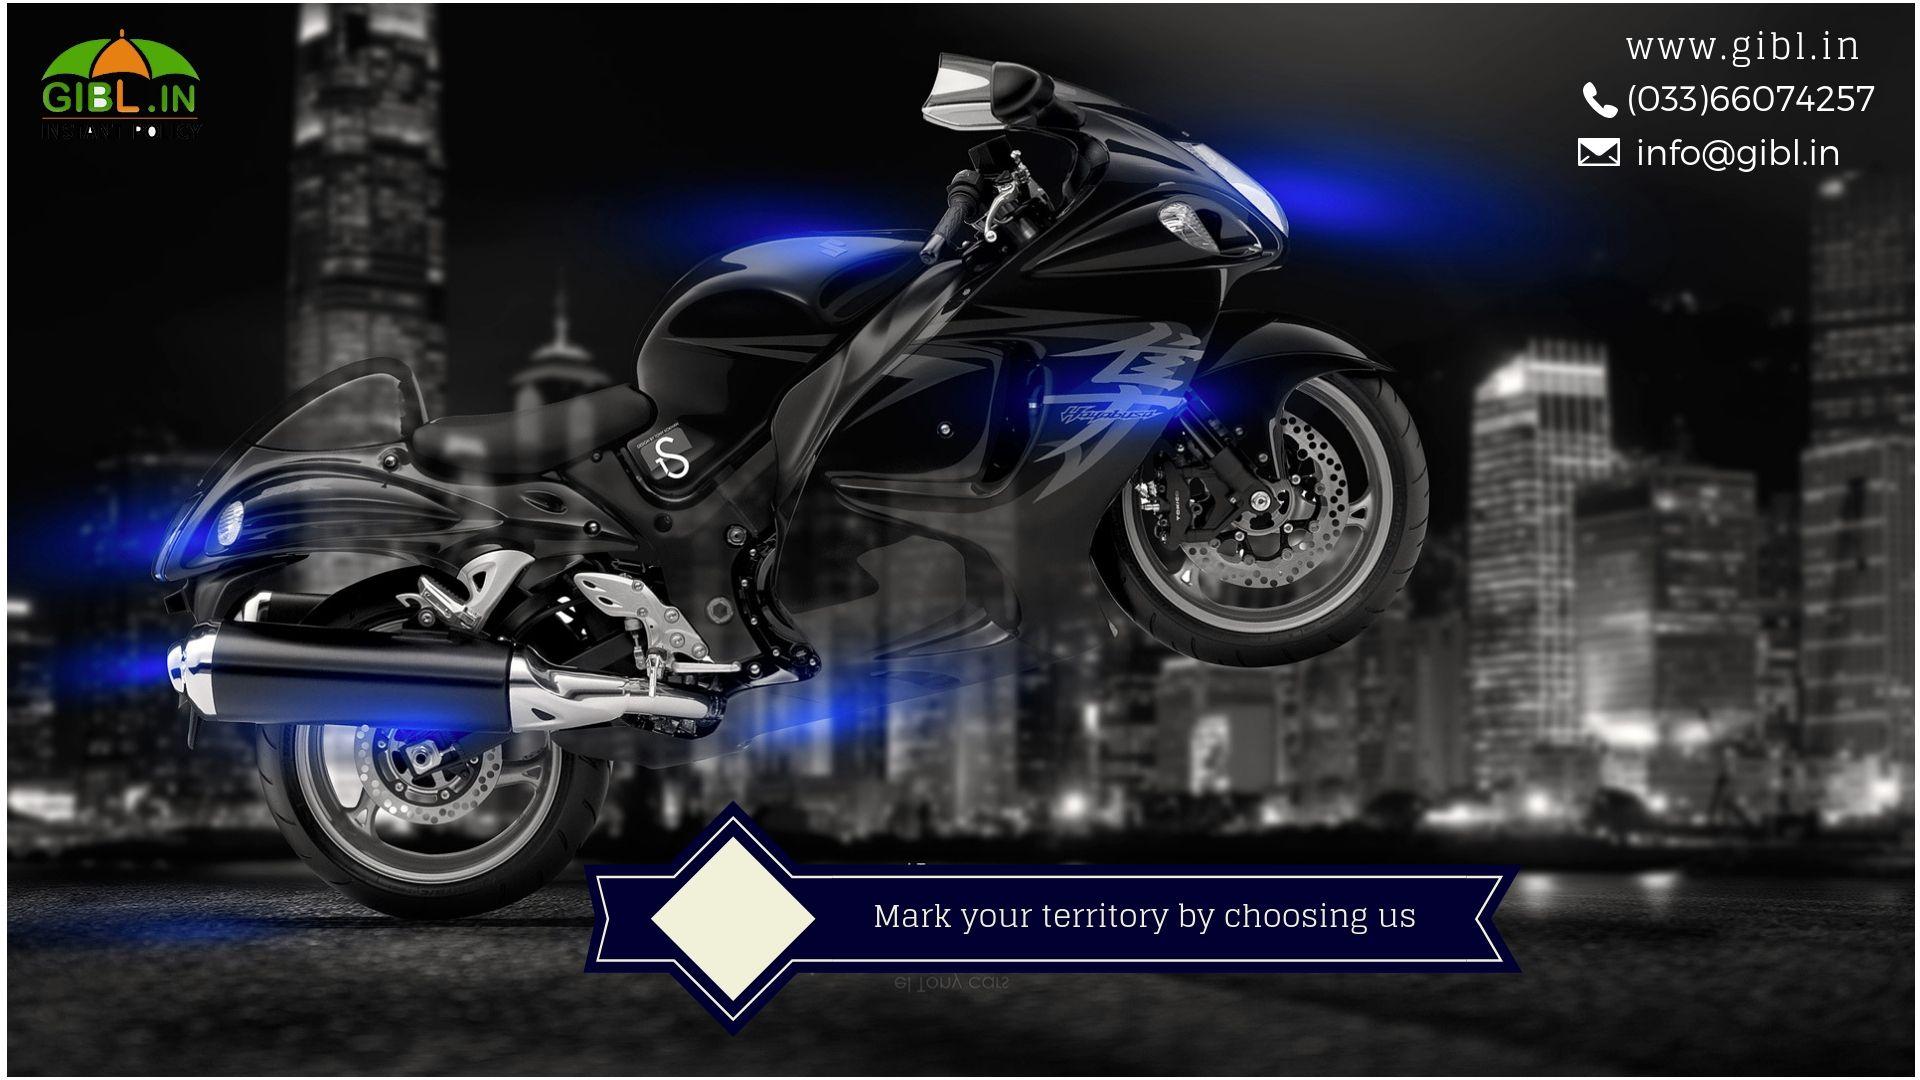 Best two wheeler insurance online in India City bike